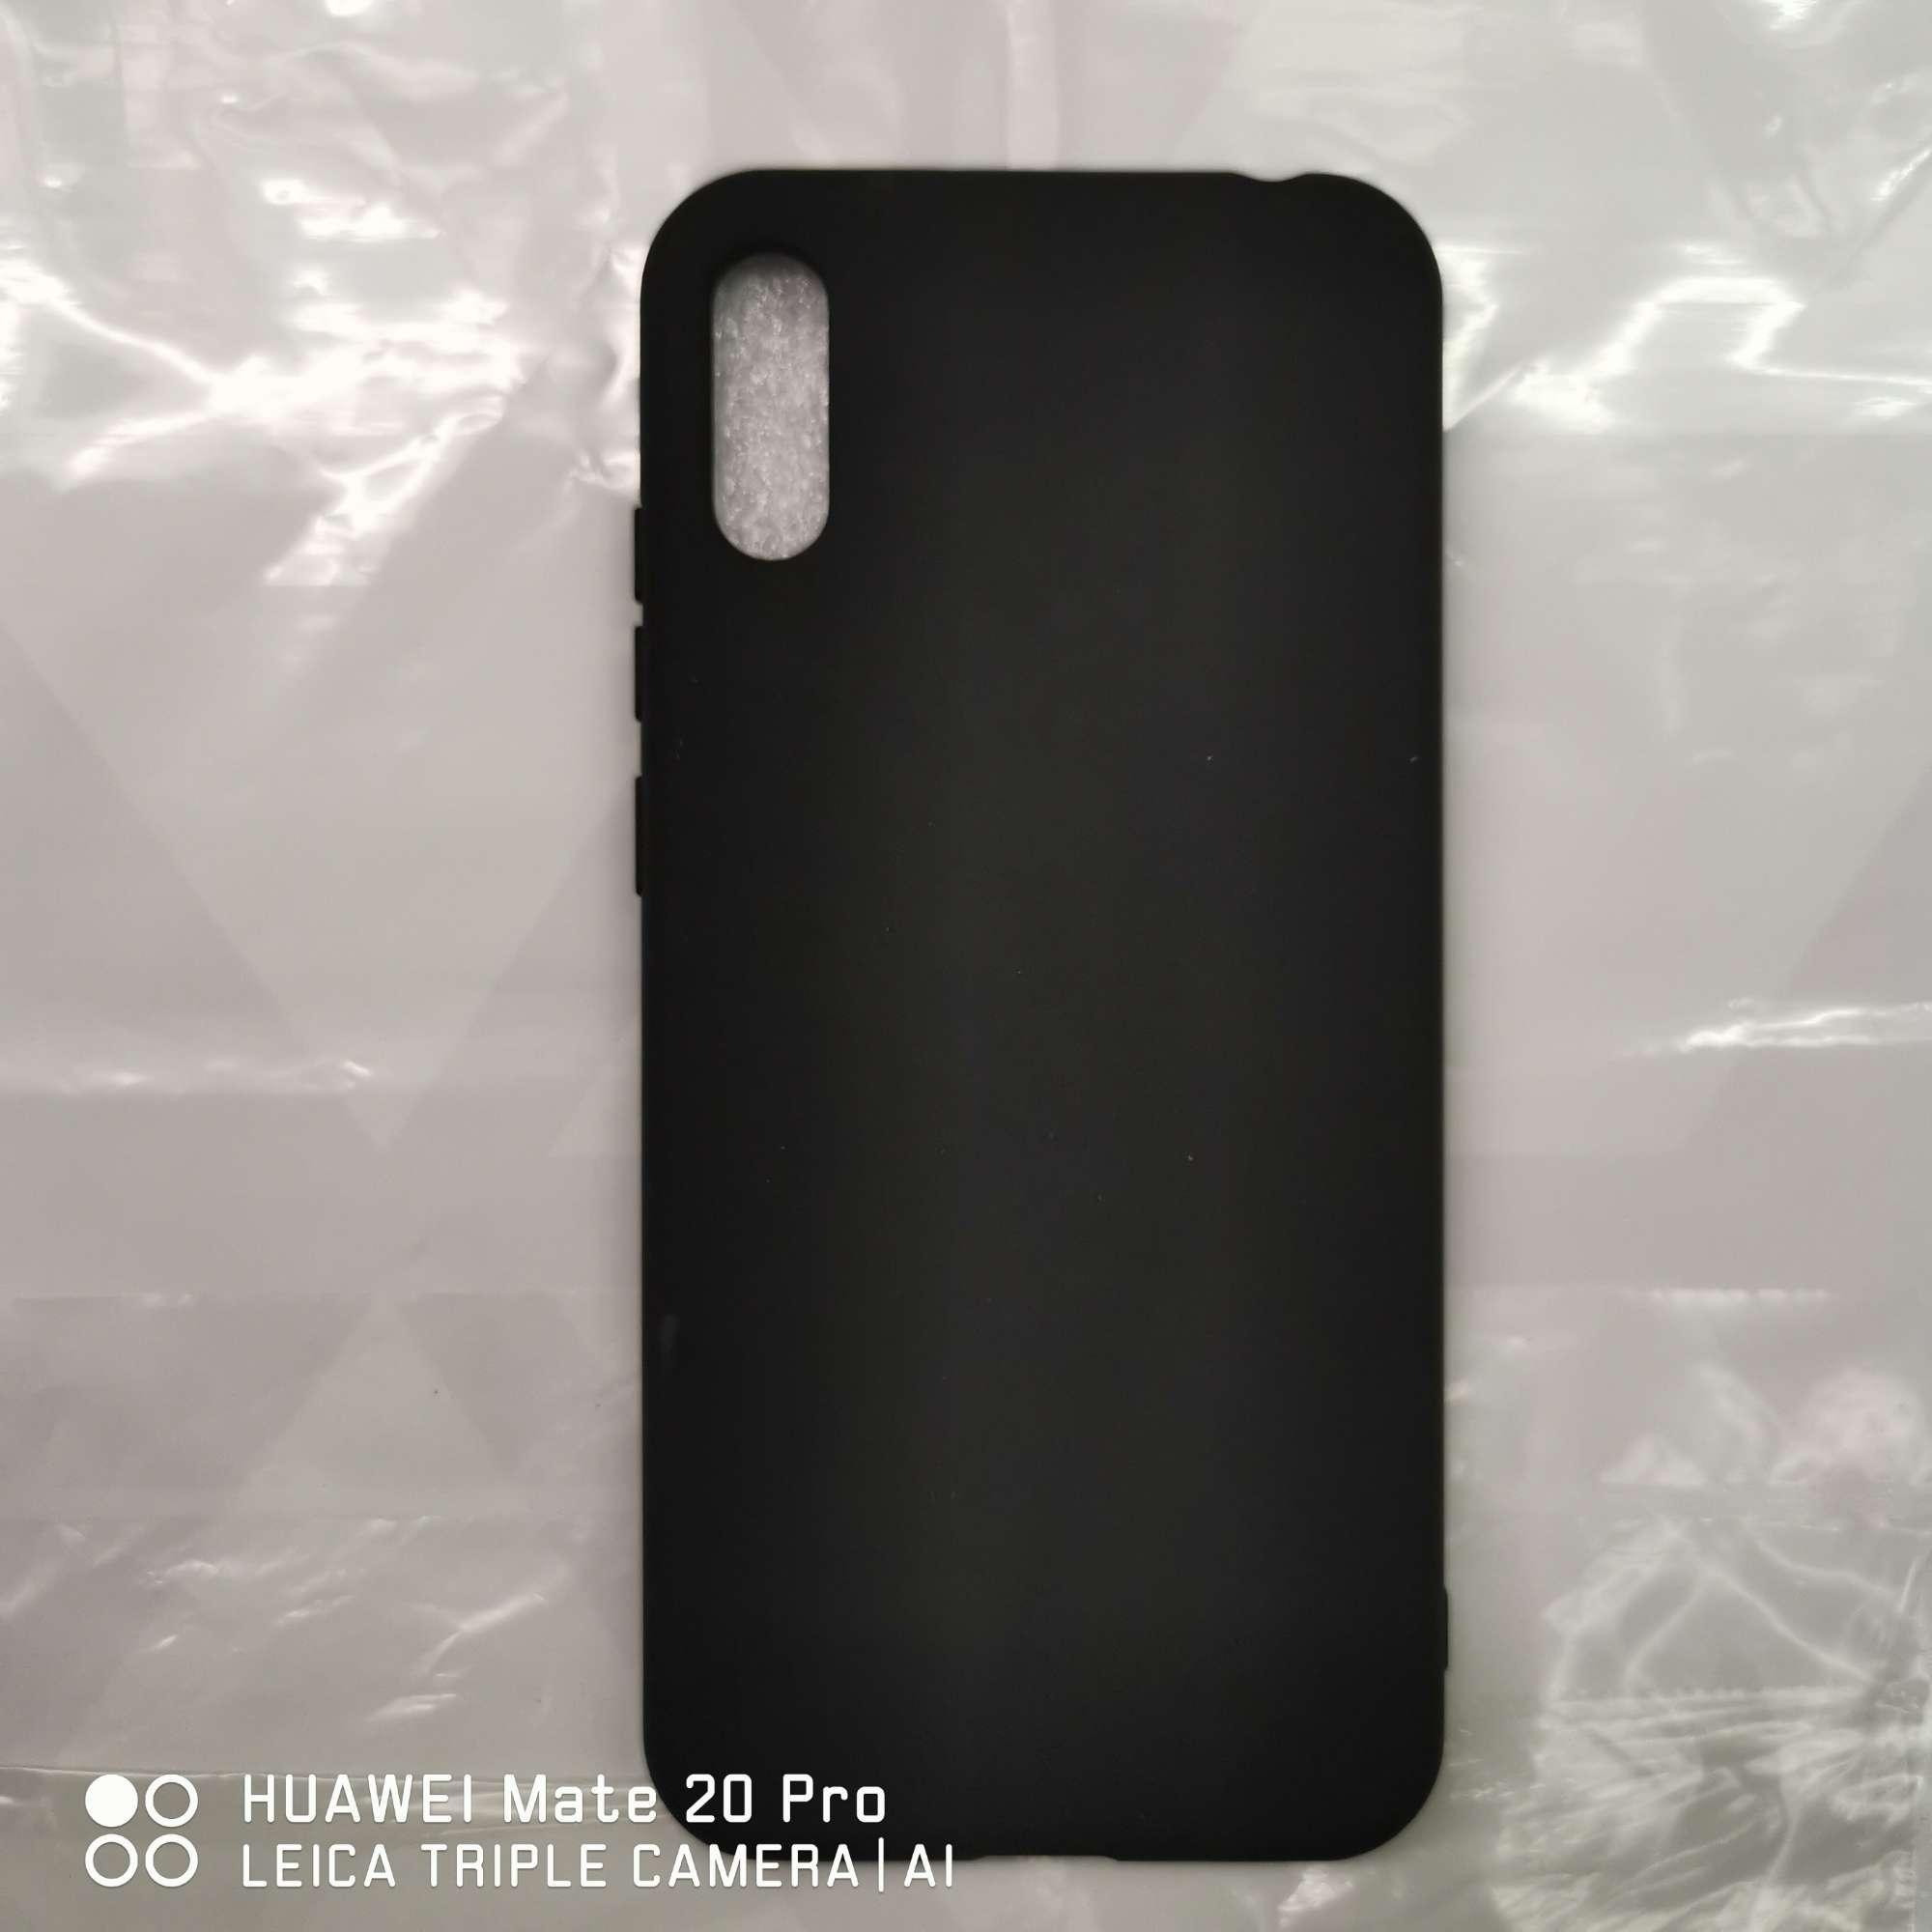 52961ab35b0e COD HUAWEI Y6 pro (2019) Candy Silicon Soft Slim Matte Case